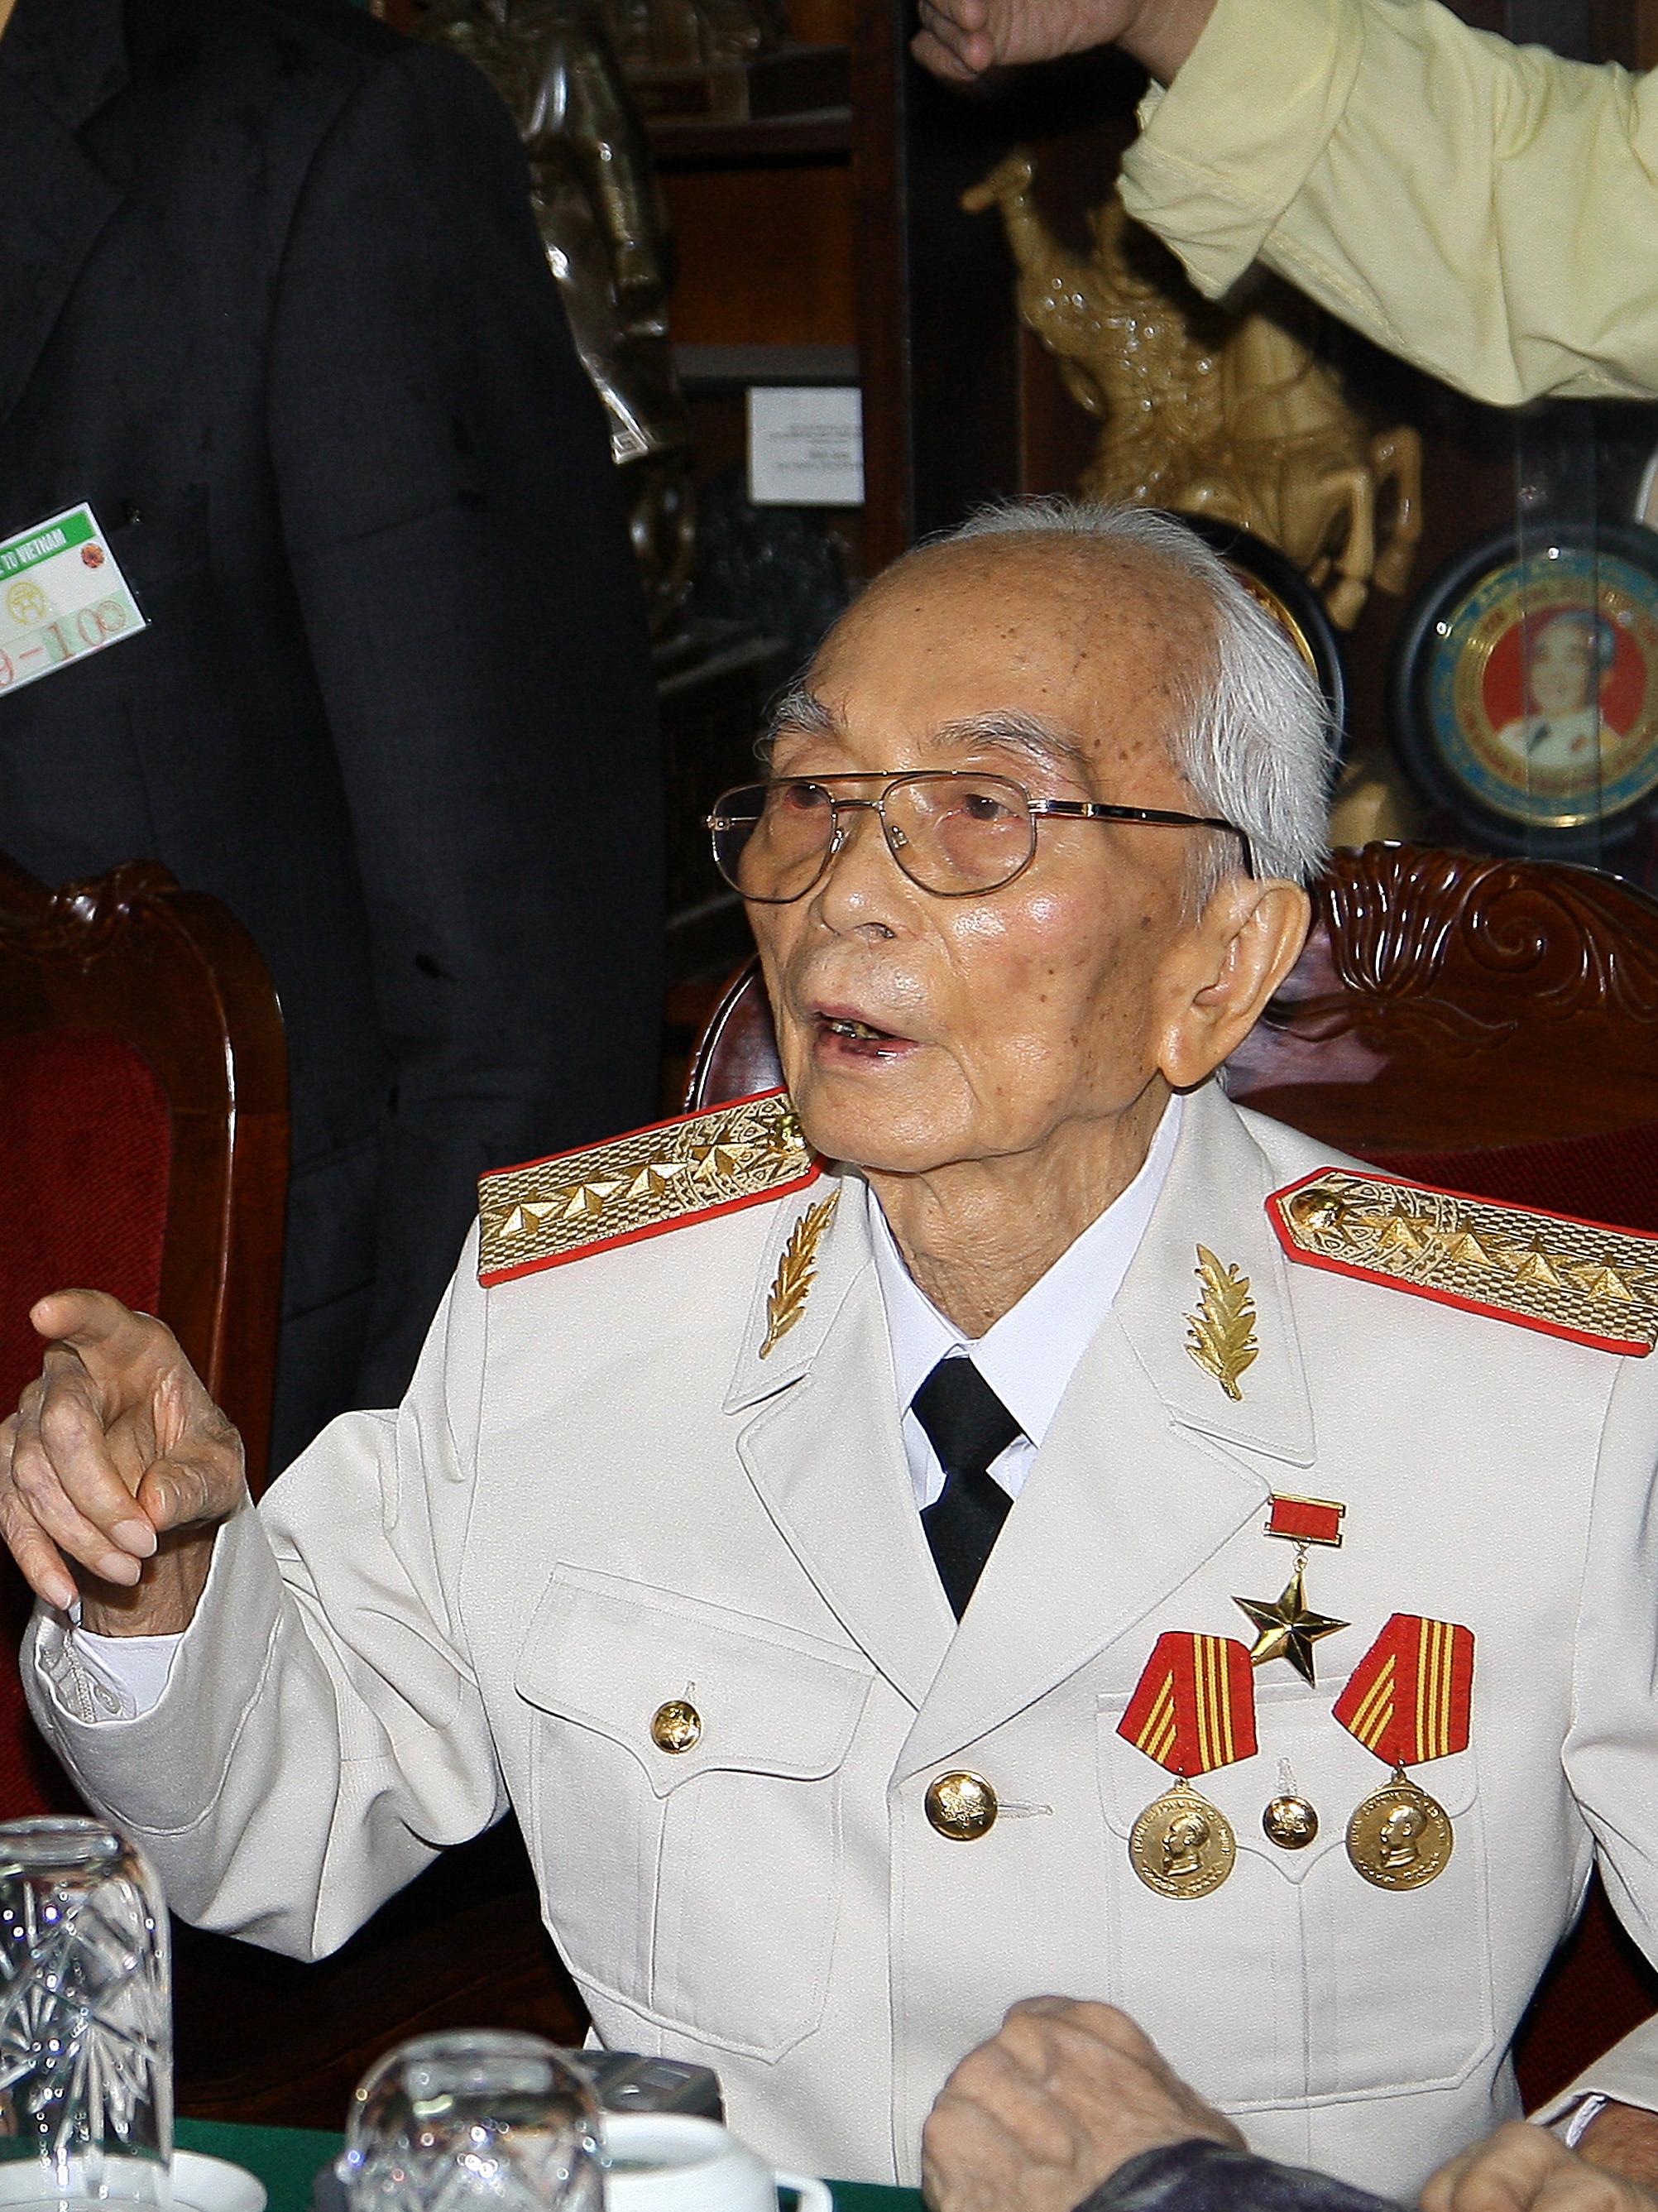 English: General Vo Nguyen Giap in 2008.